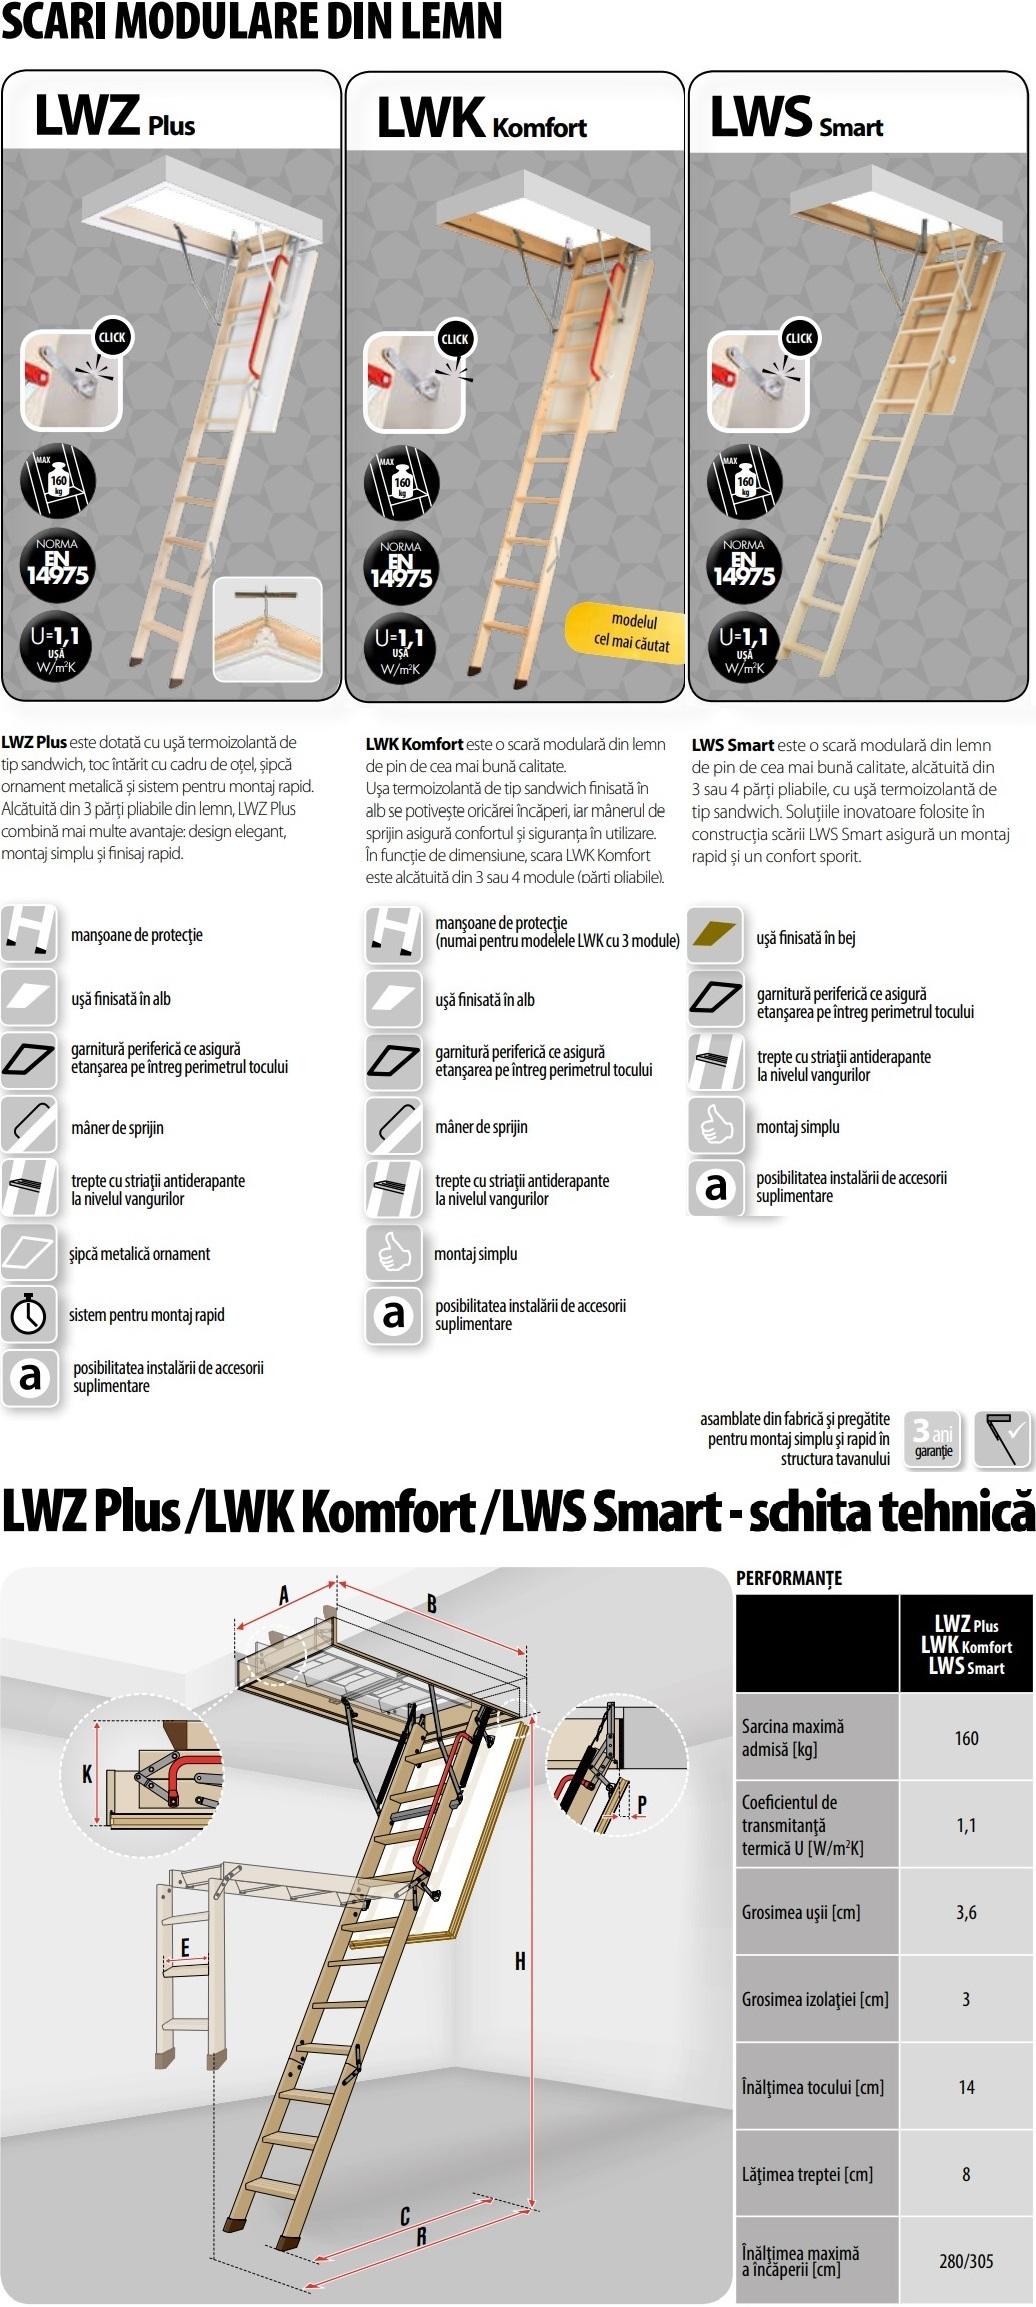 scari din lemn LWZ Plus-LWK Komfort -LWS Smart-fakro